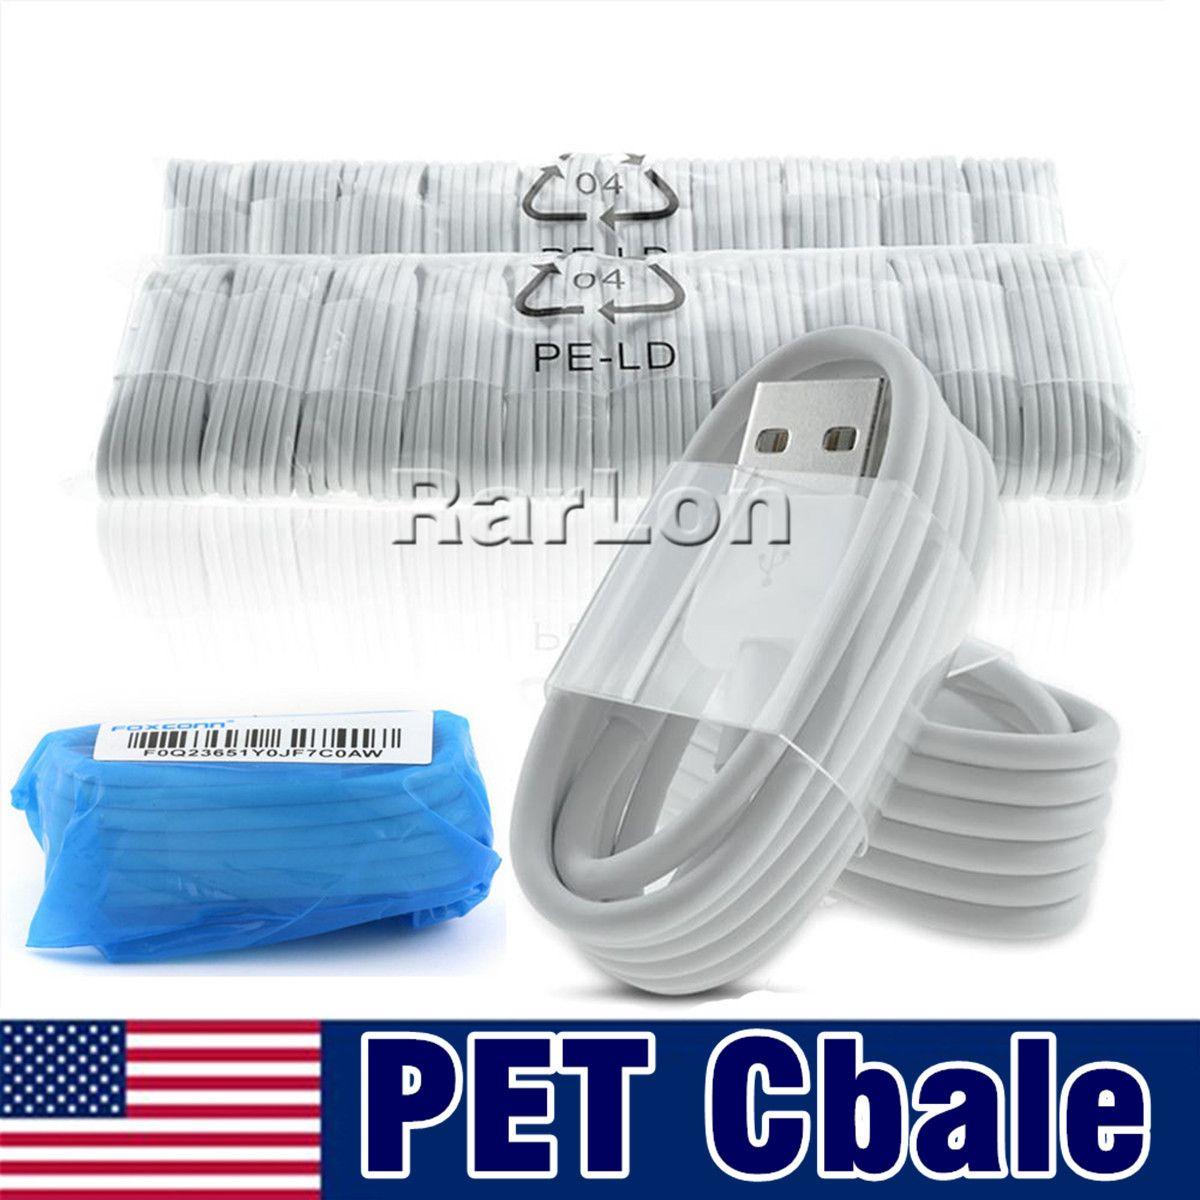 Usb Kabel 10 Meter Original Qualität Typ C Micro Usb Kabel High ...